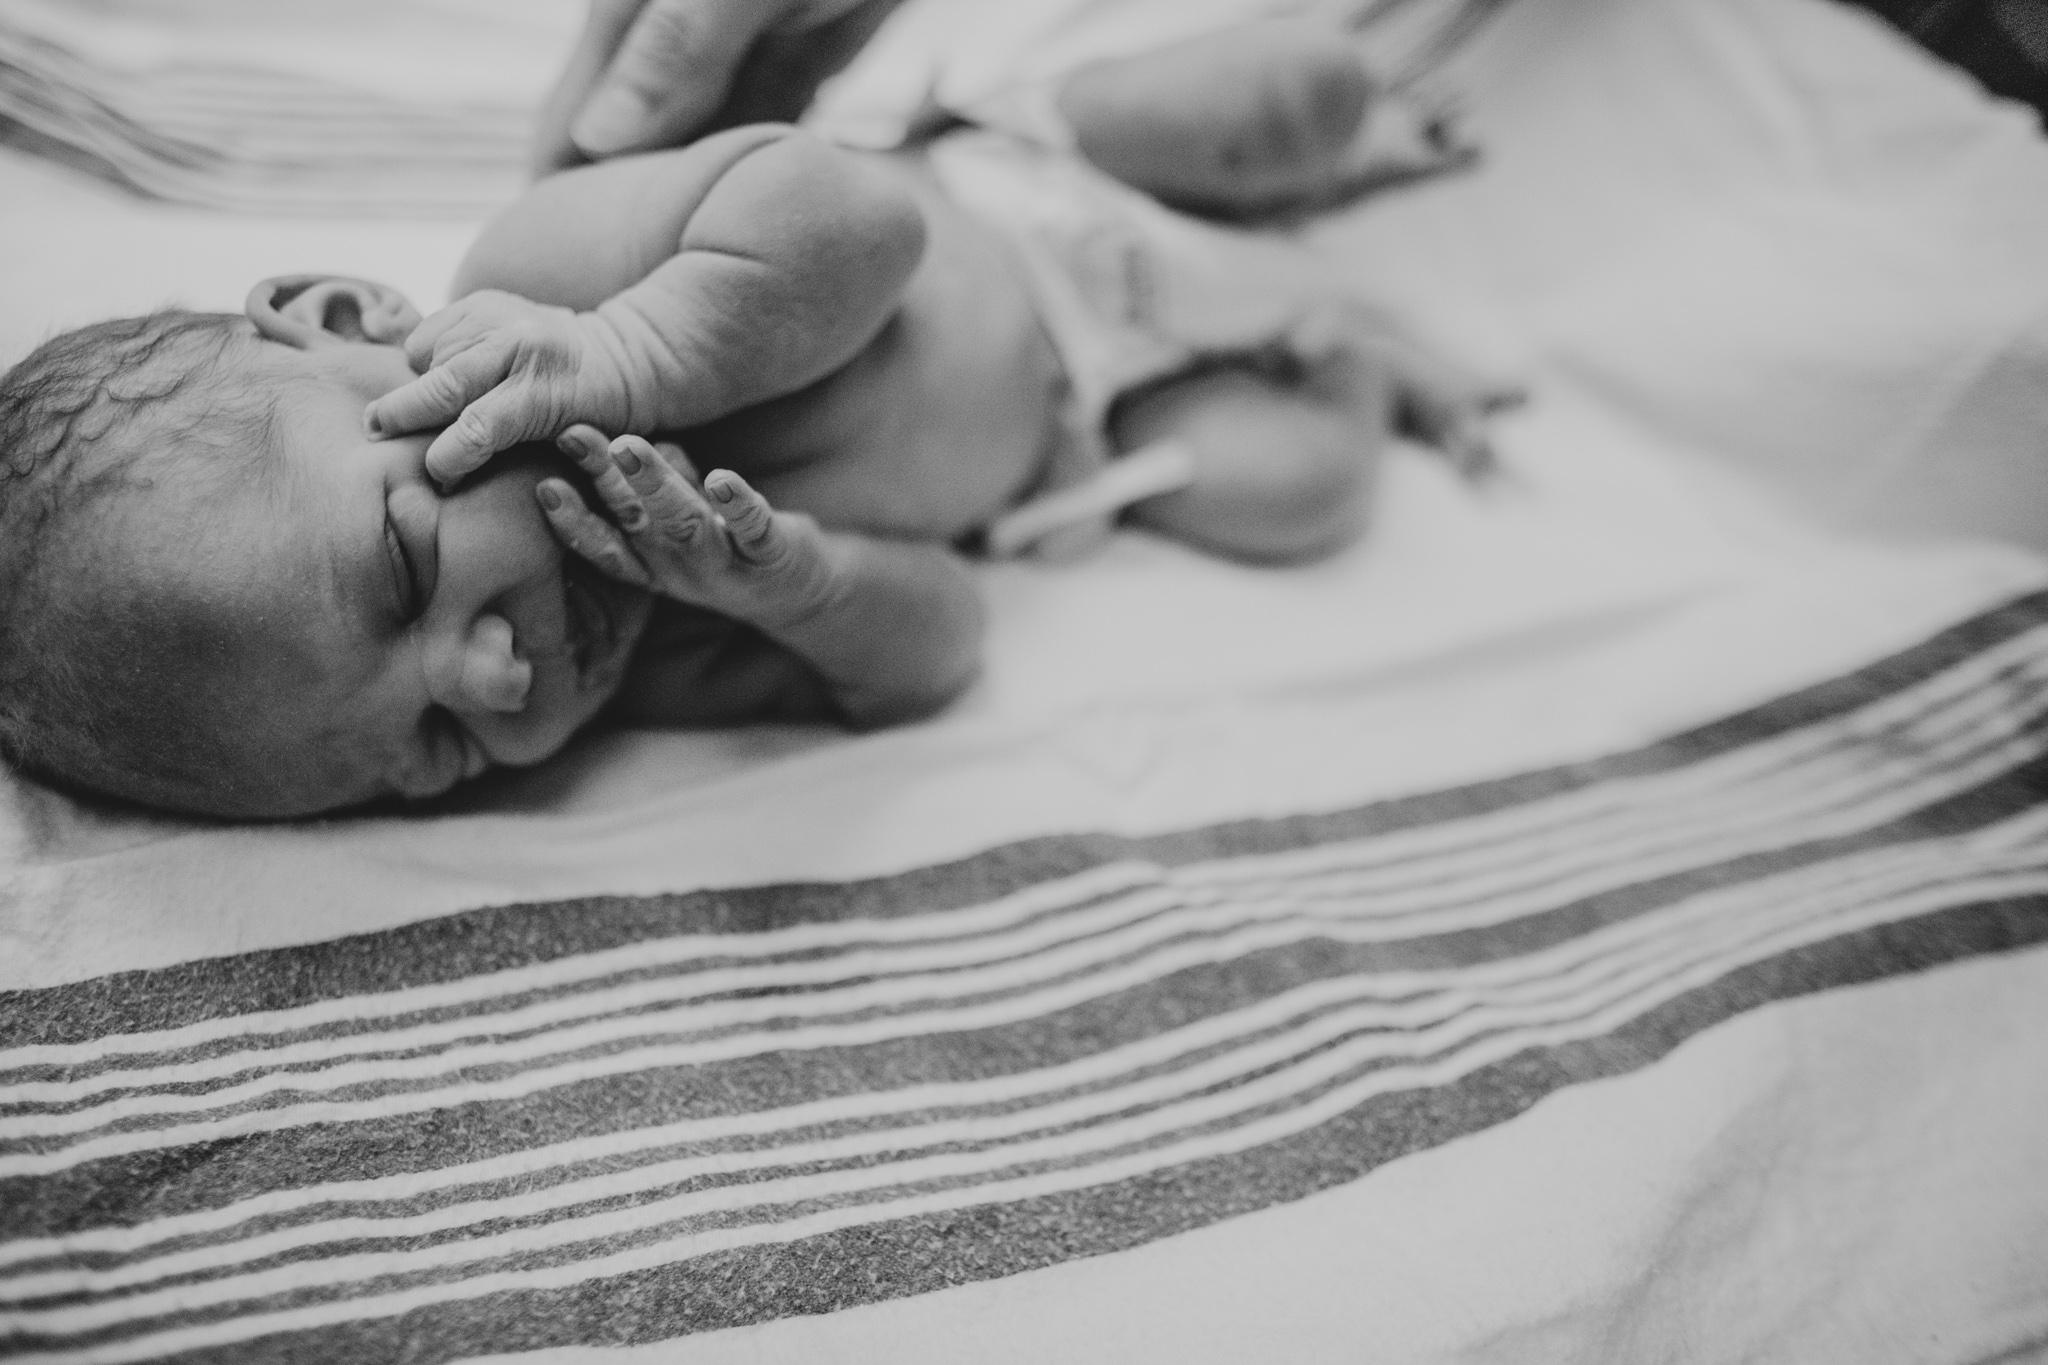 Newborn baby at Hospital Fresh 48